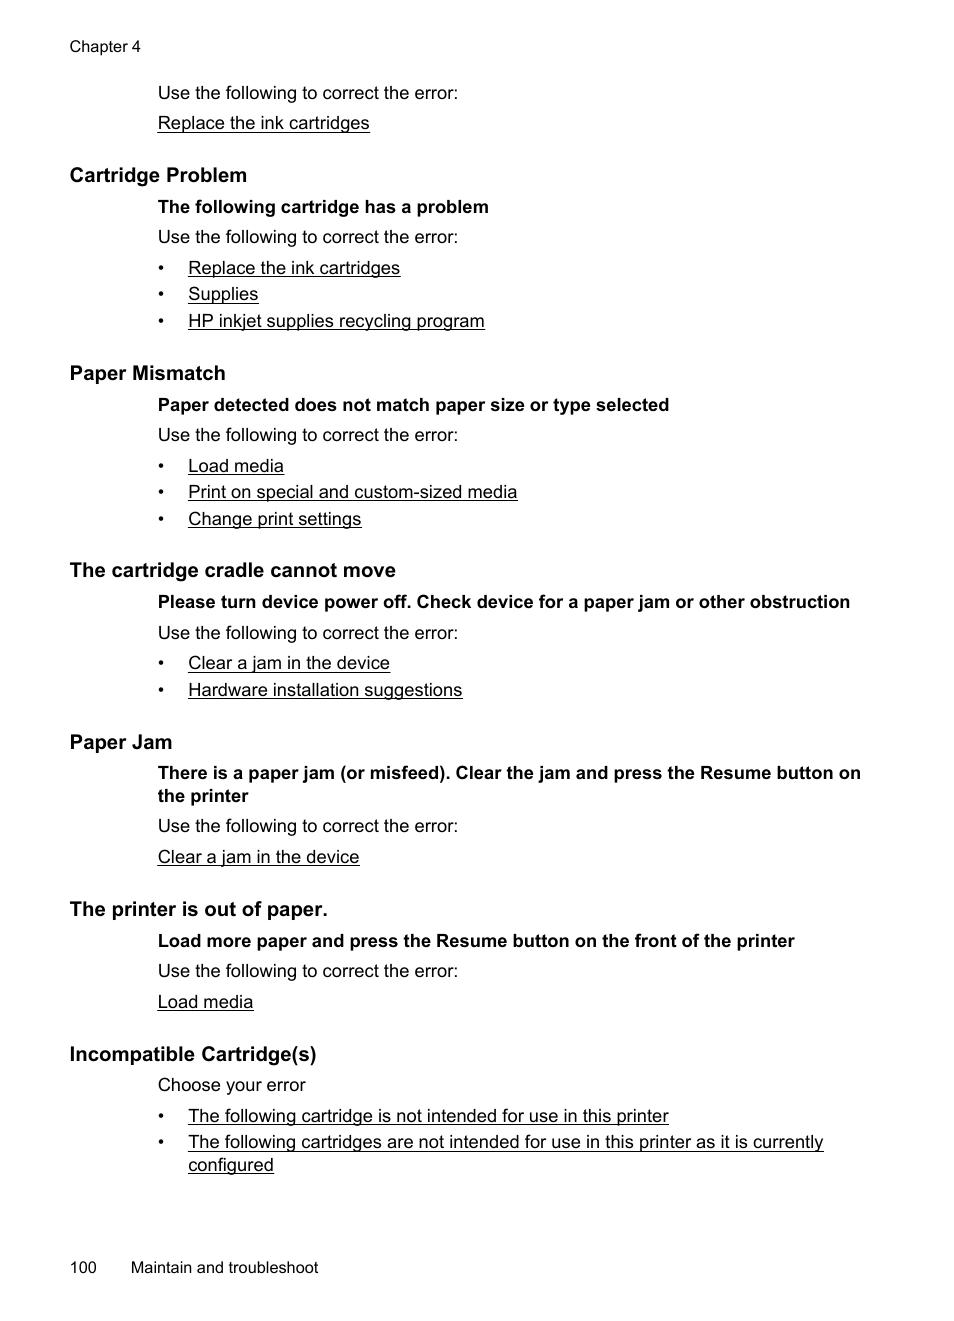 Paper Mismatch Error Galvinsdinnerhousestjoe Block Diagram Xeroxwc3045 Cartridge Problem The Cradle Cannot Move Hp Officejet 7000 Wide